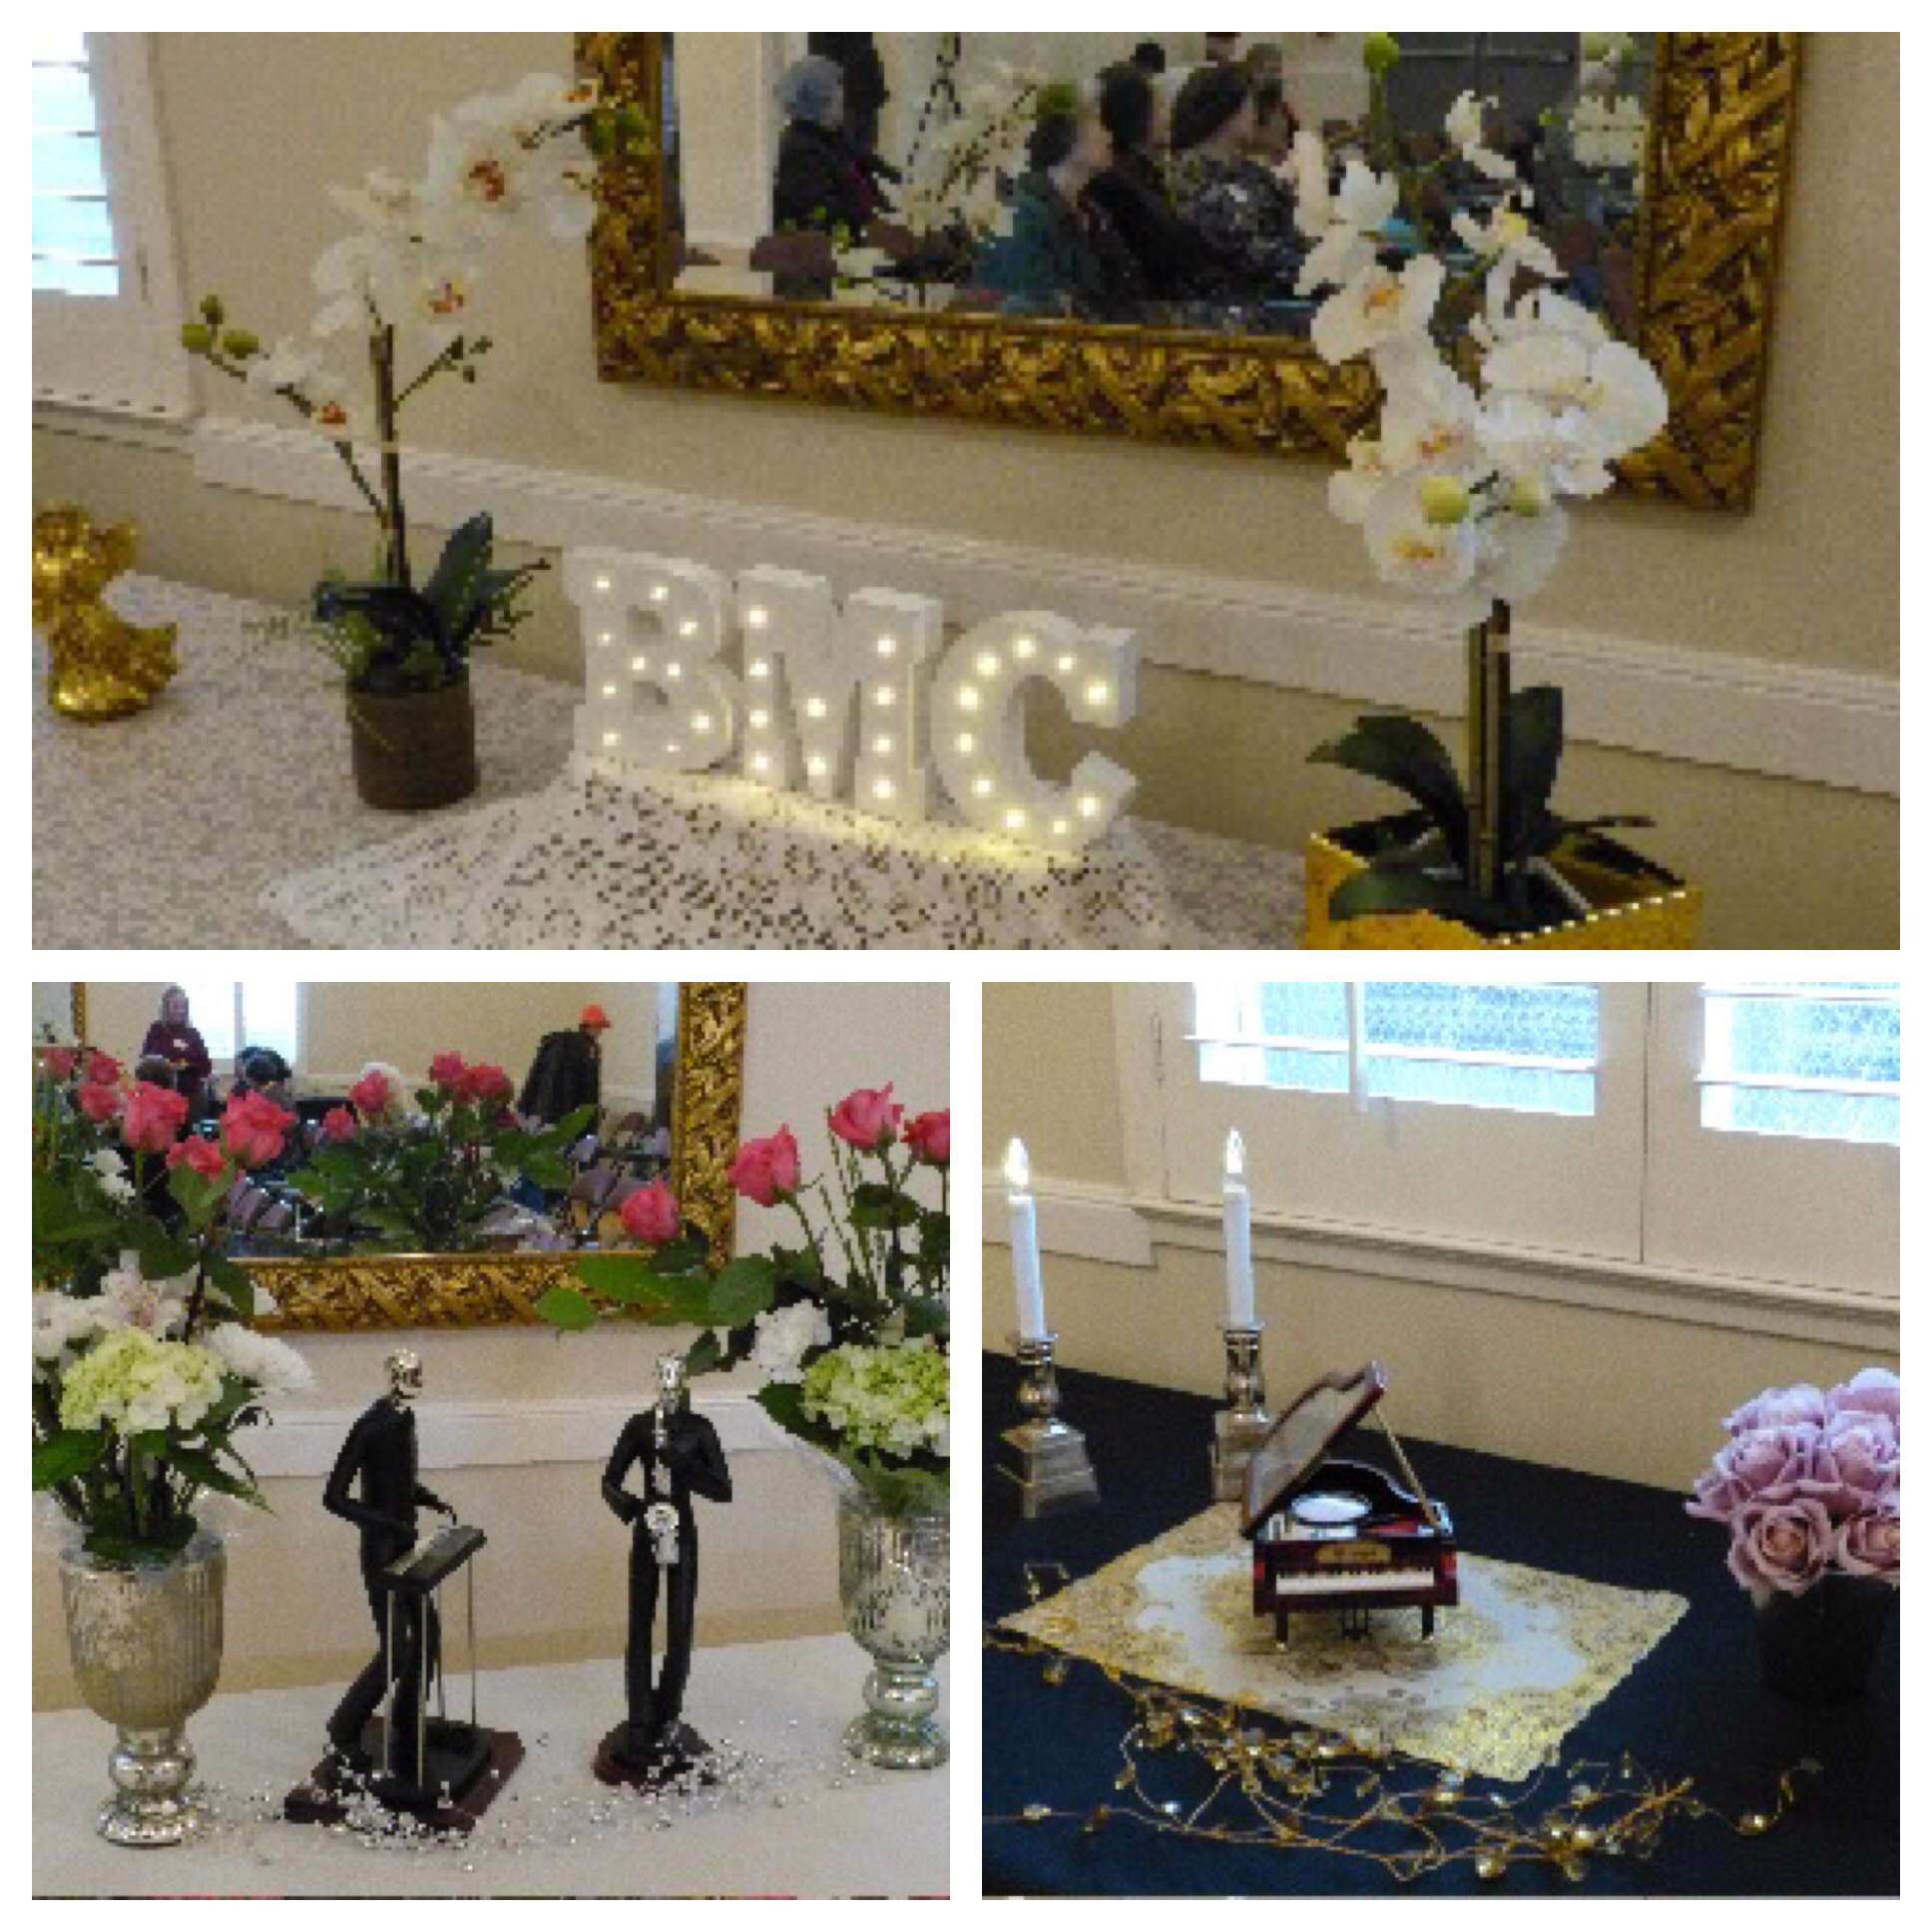 Photo collage of BMC decorations.